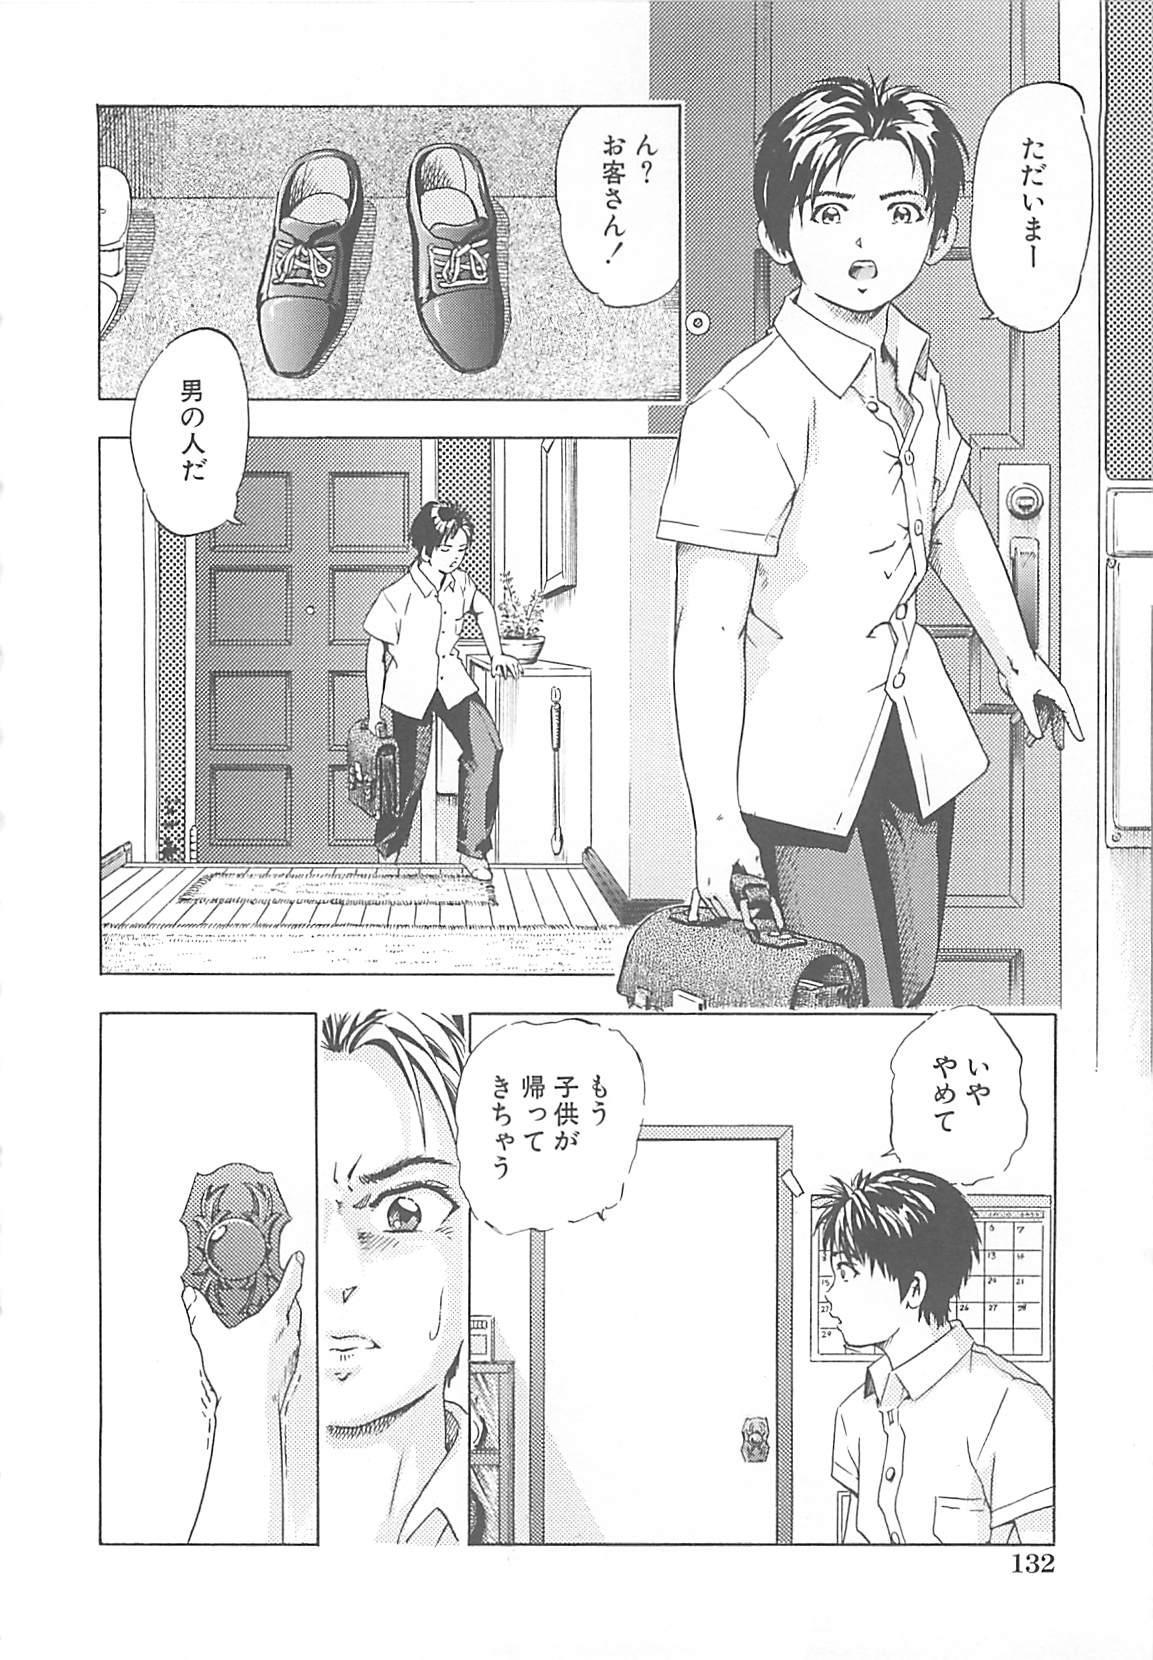 Kanin Kyoushitsu - Adultery Classroom 132